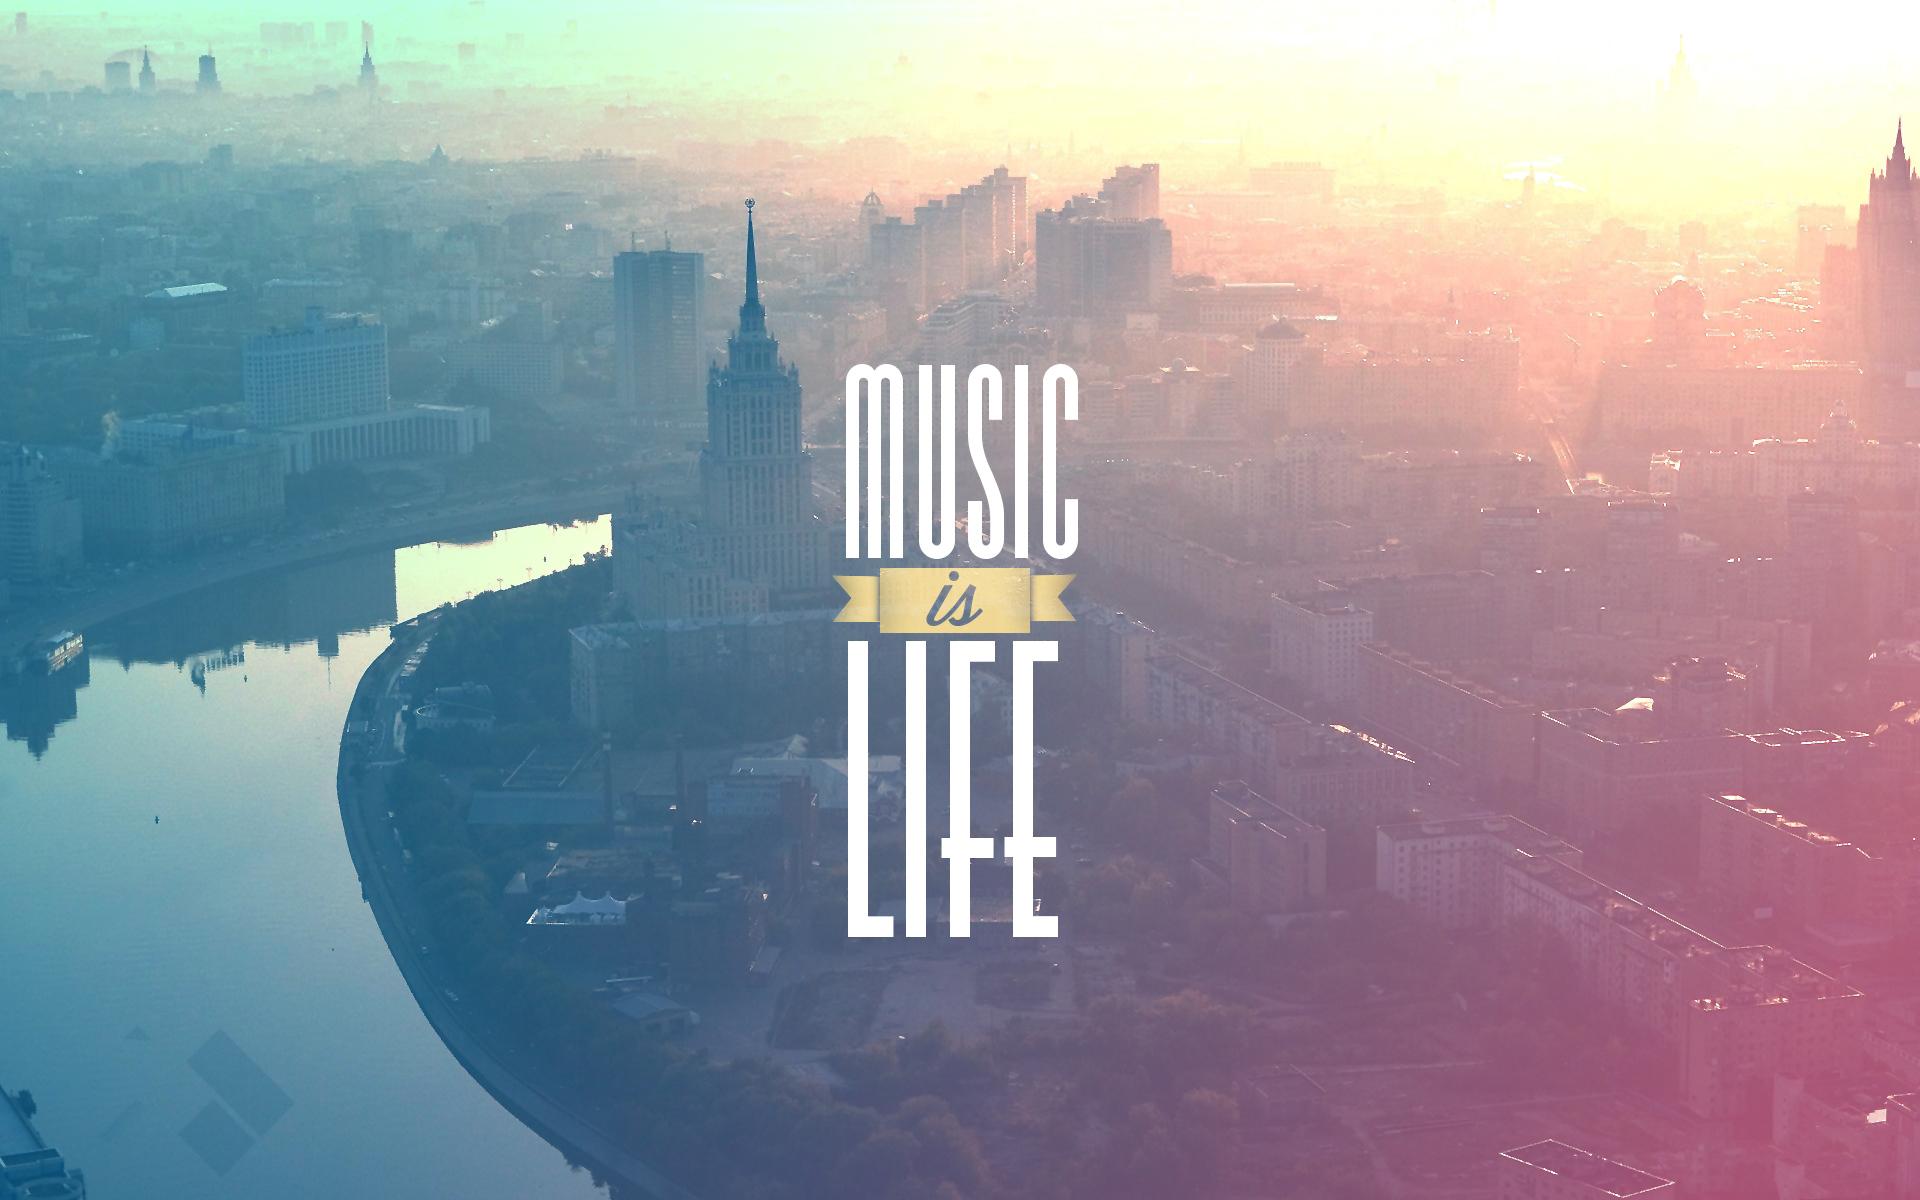 Music Is Life Wallpaper Hd - HD Wallpaper